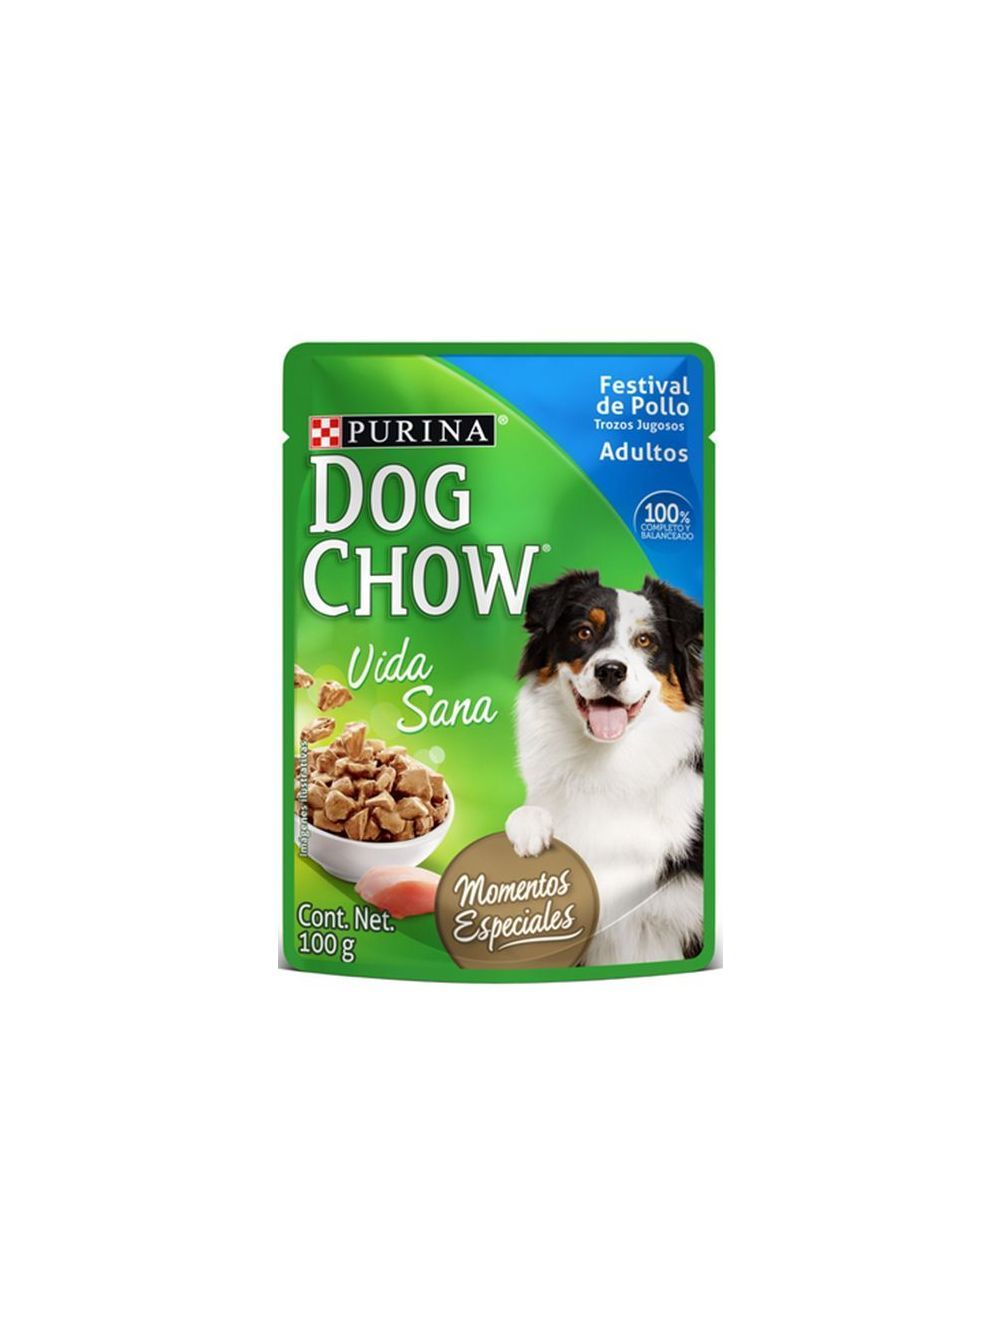 Dog chow pouch Festival de pollo - P80